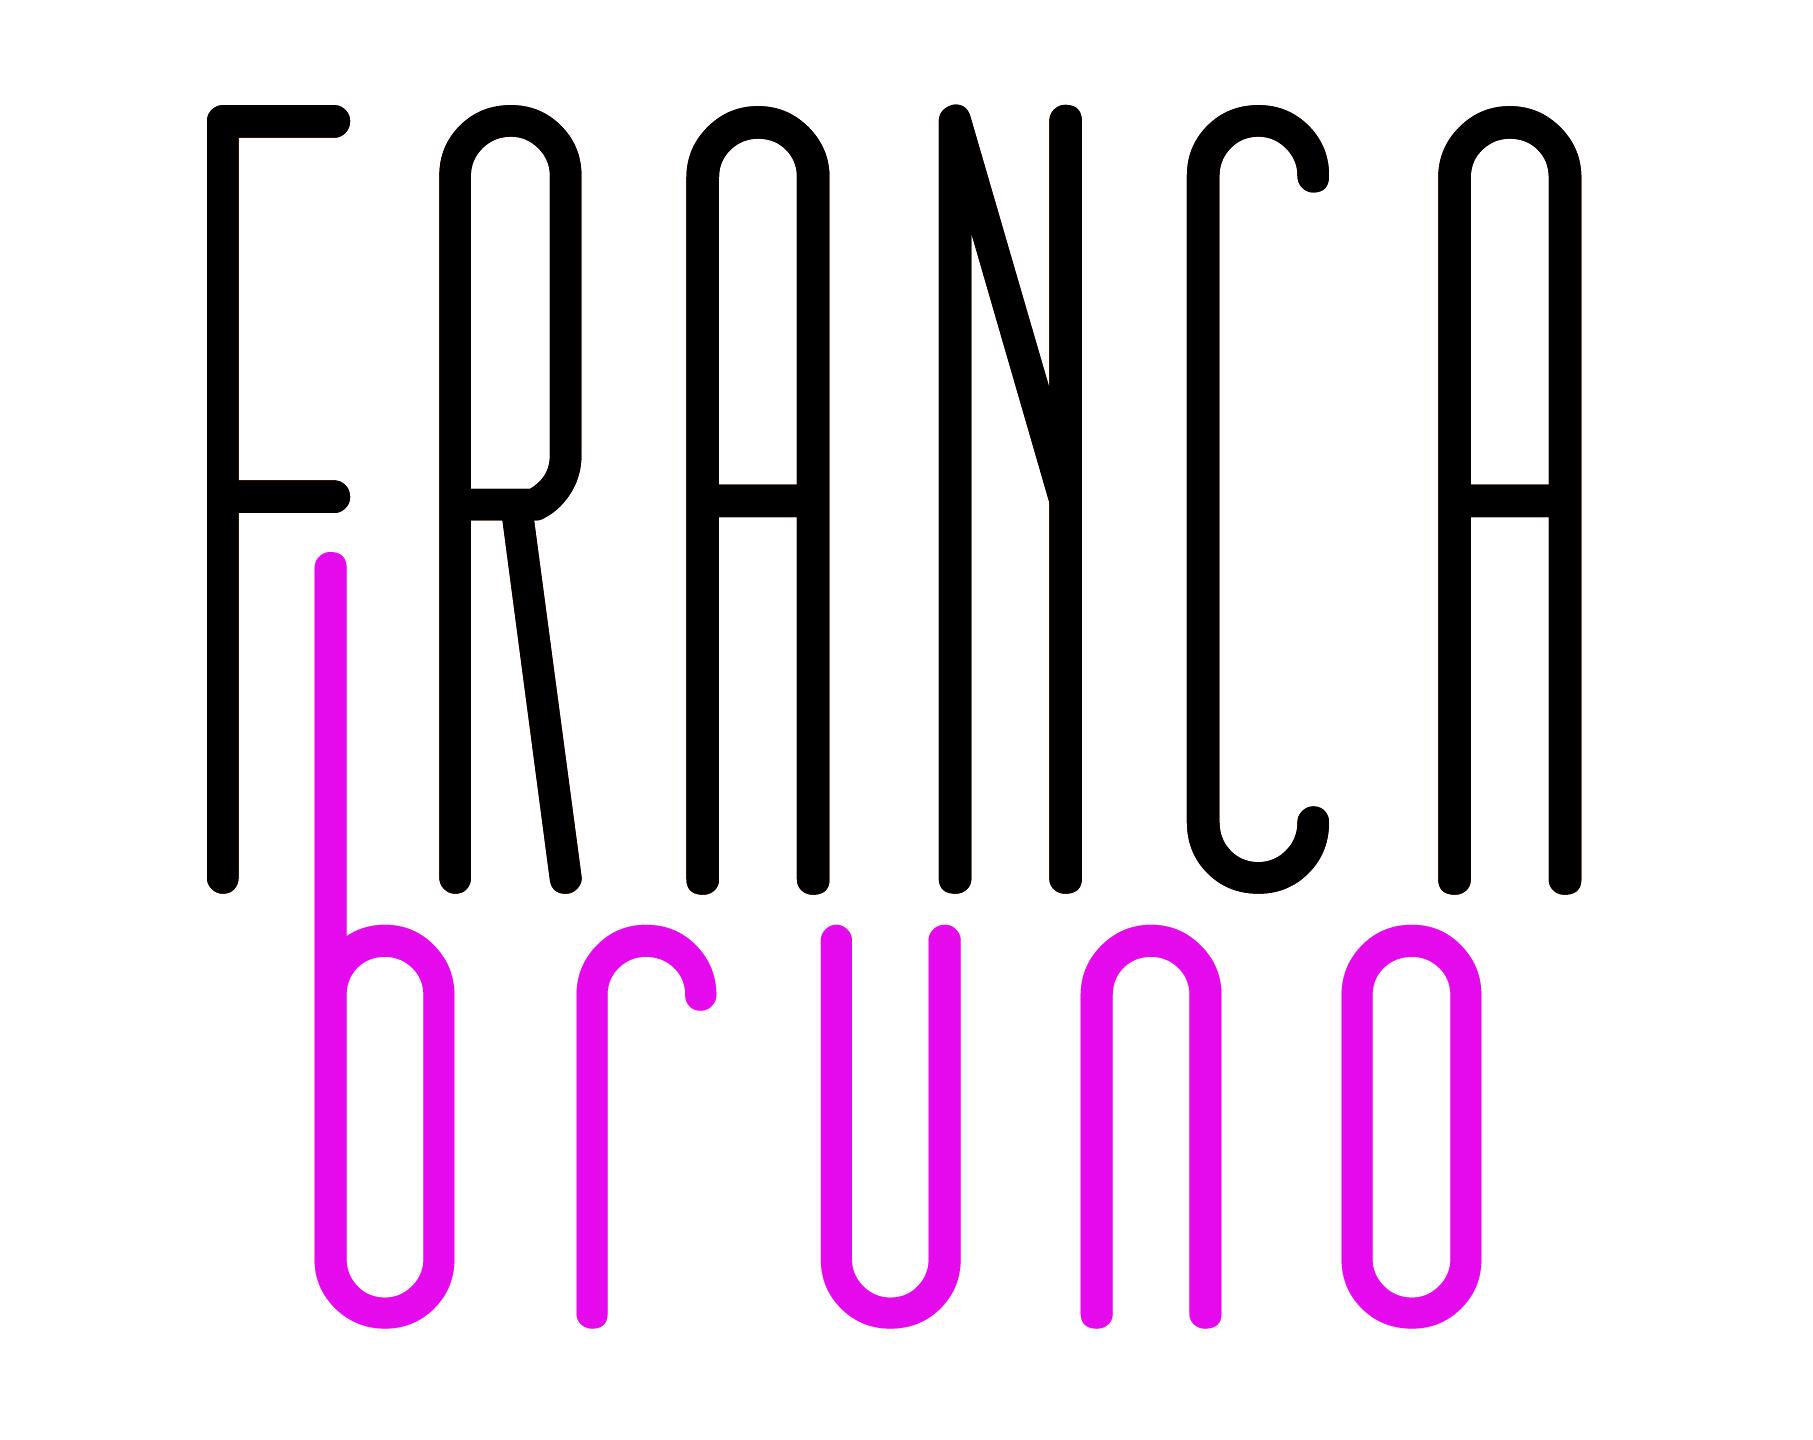 Centre Franca Bruno